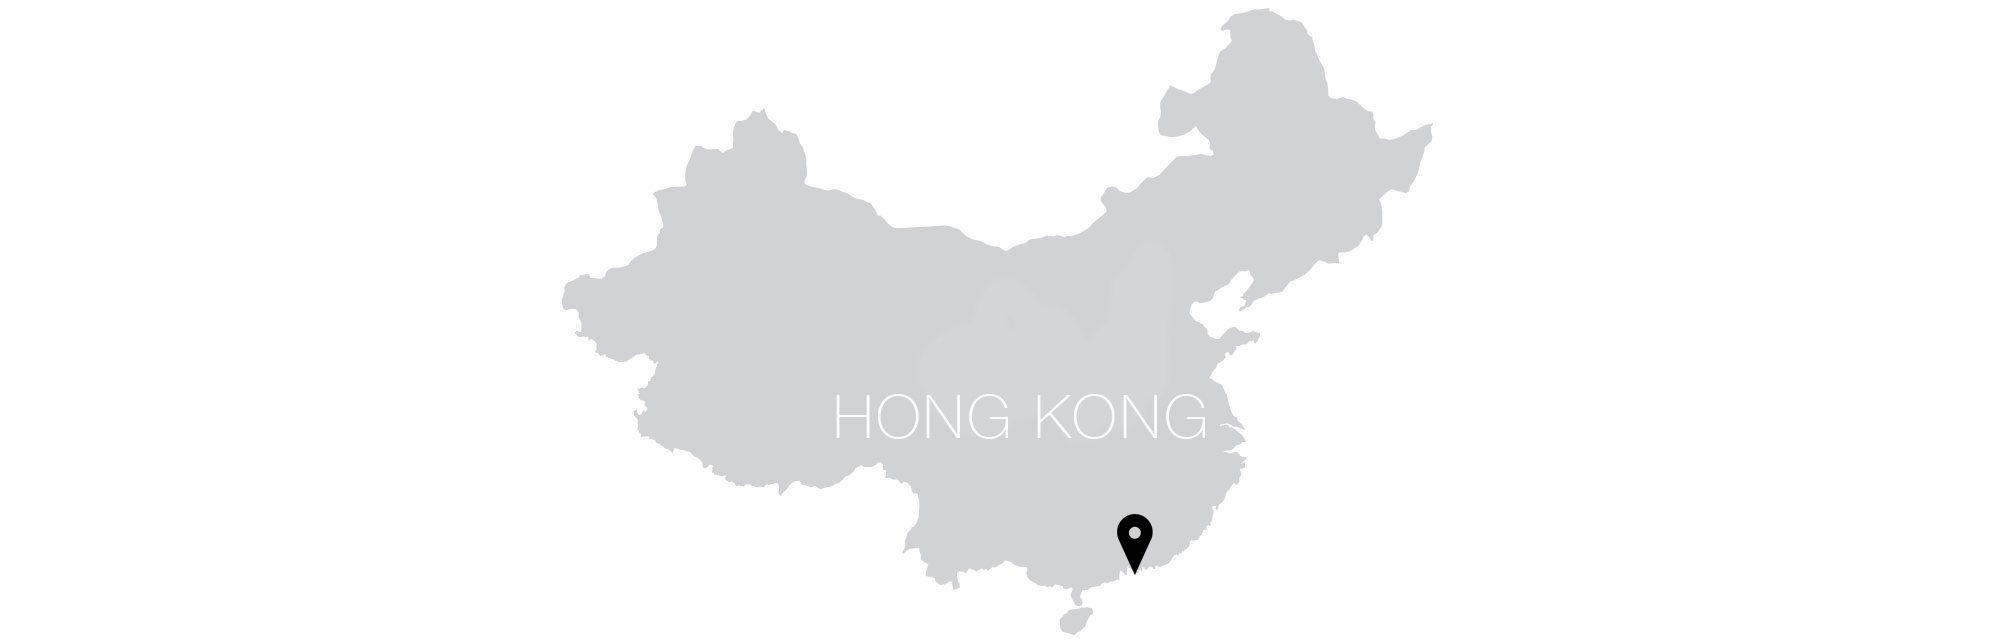 Hongkong Map Text